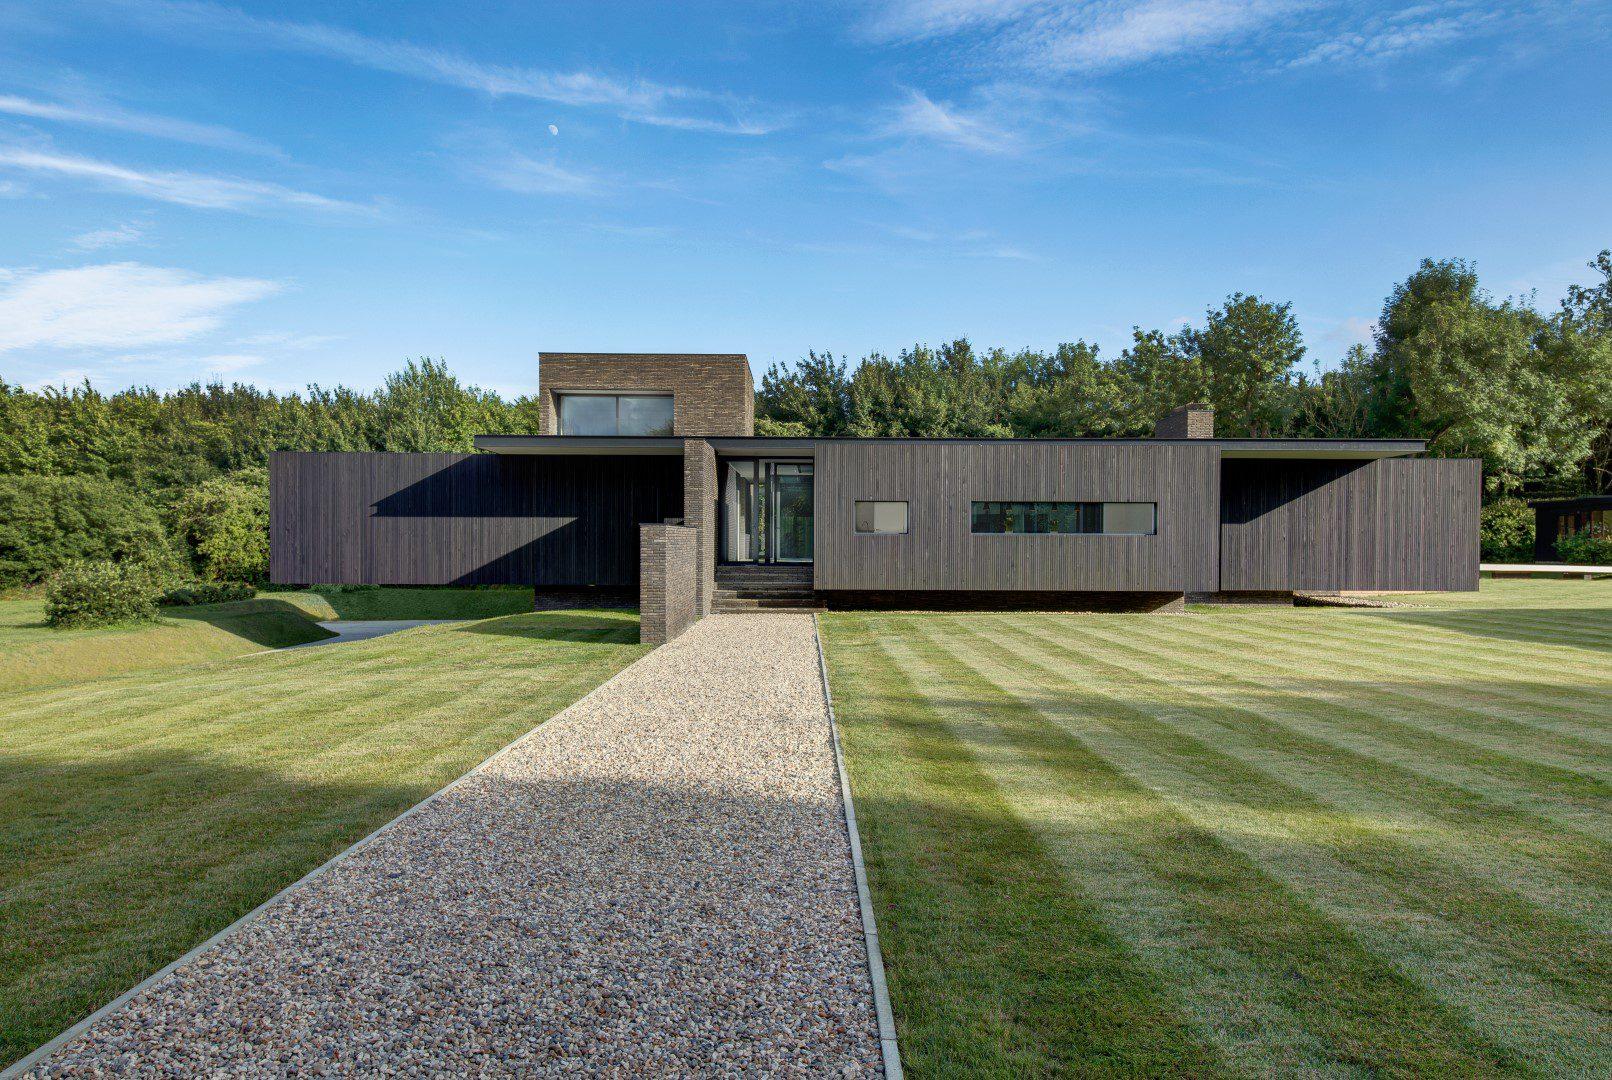 Sleek modern home looks like it's floating